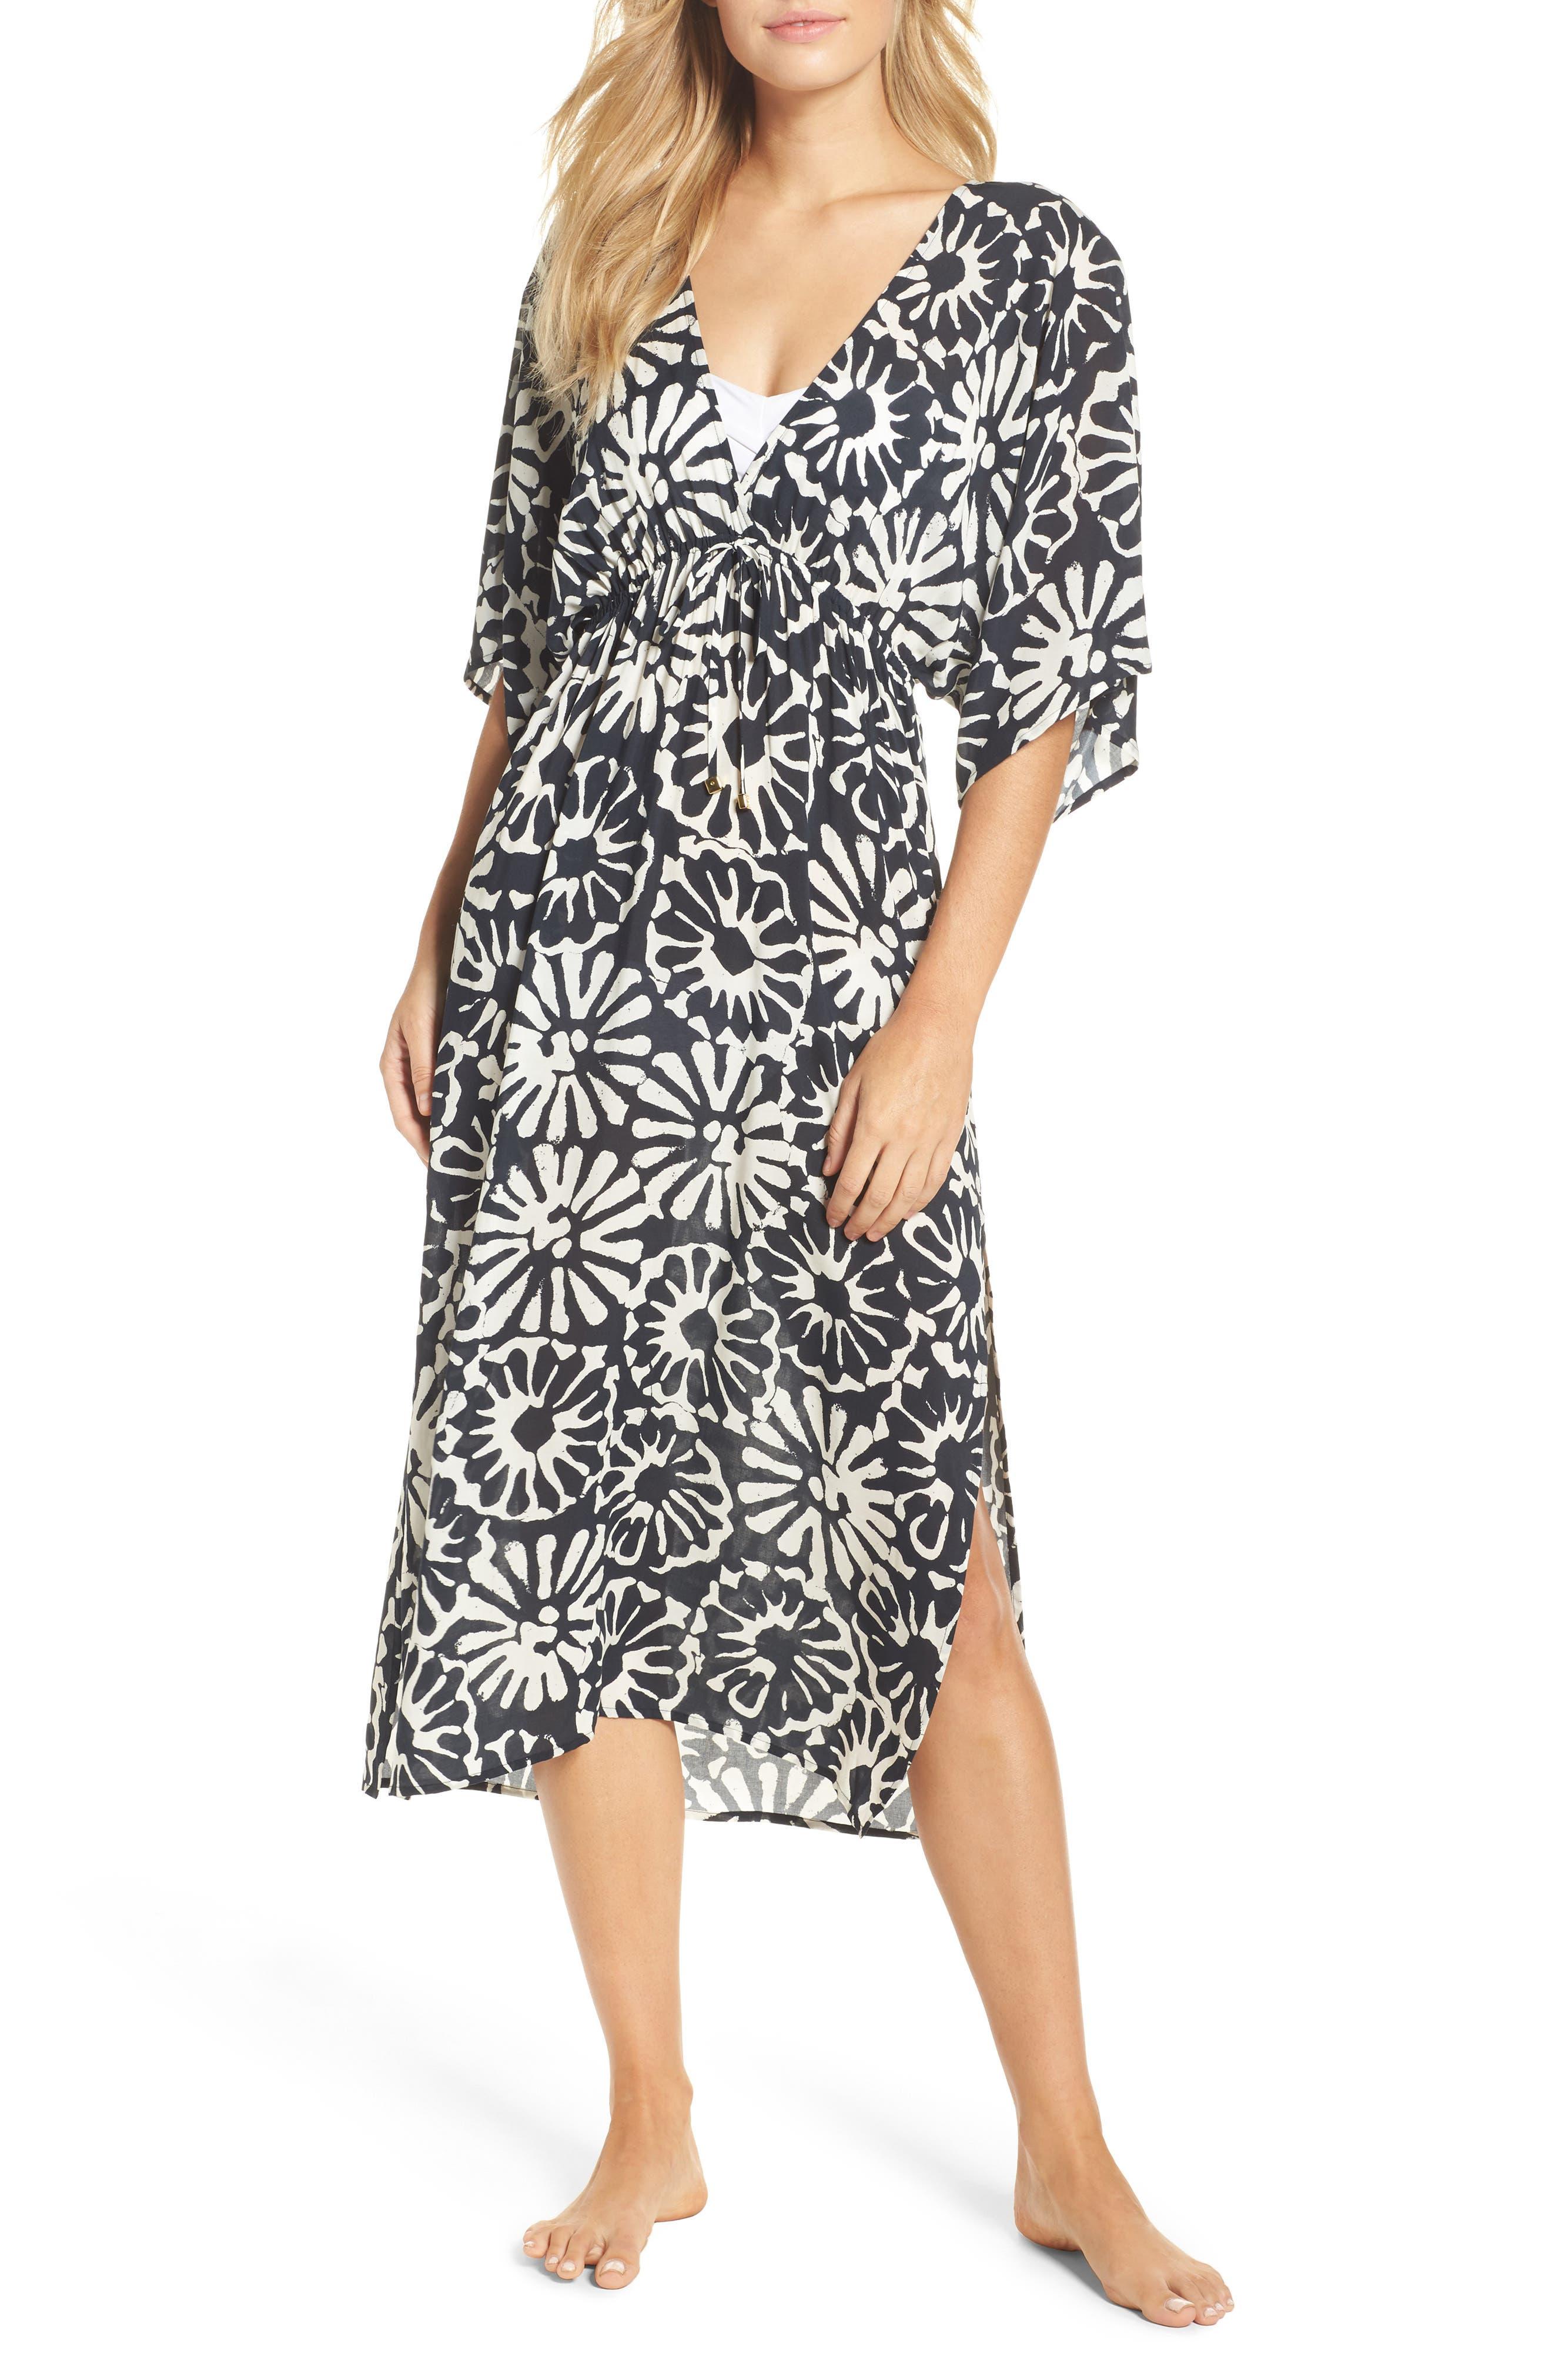 Pomelo Floral Cover-Up Dress,                         Main,                         color, Ivory Pomelo Floral